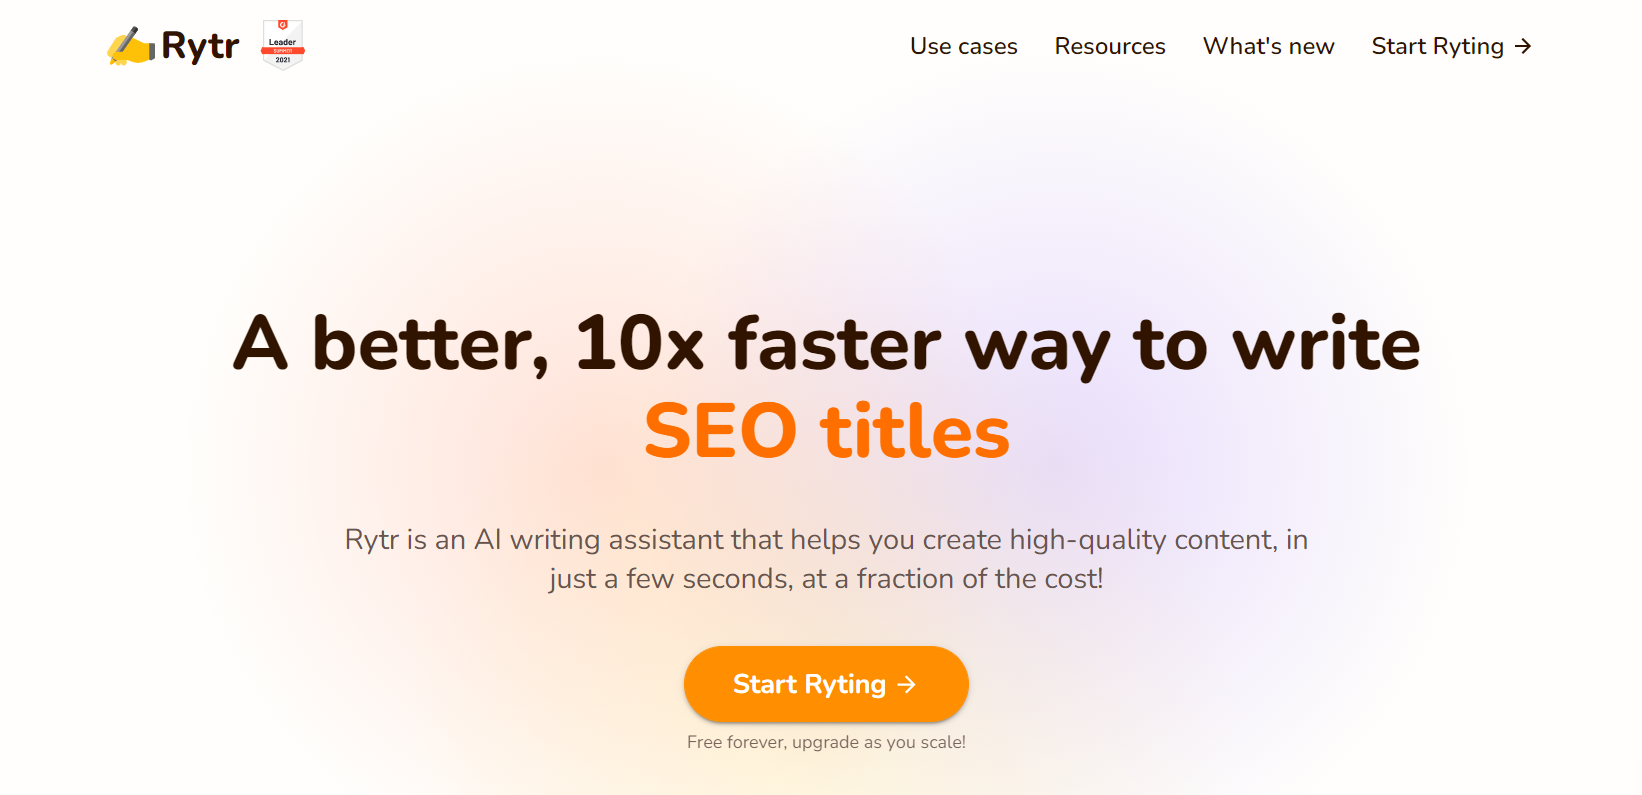 Ryter.com blogging tool for newbie cannabis writers homepage screenshot.